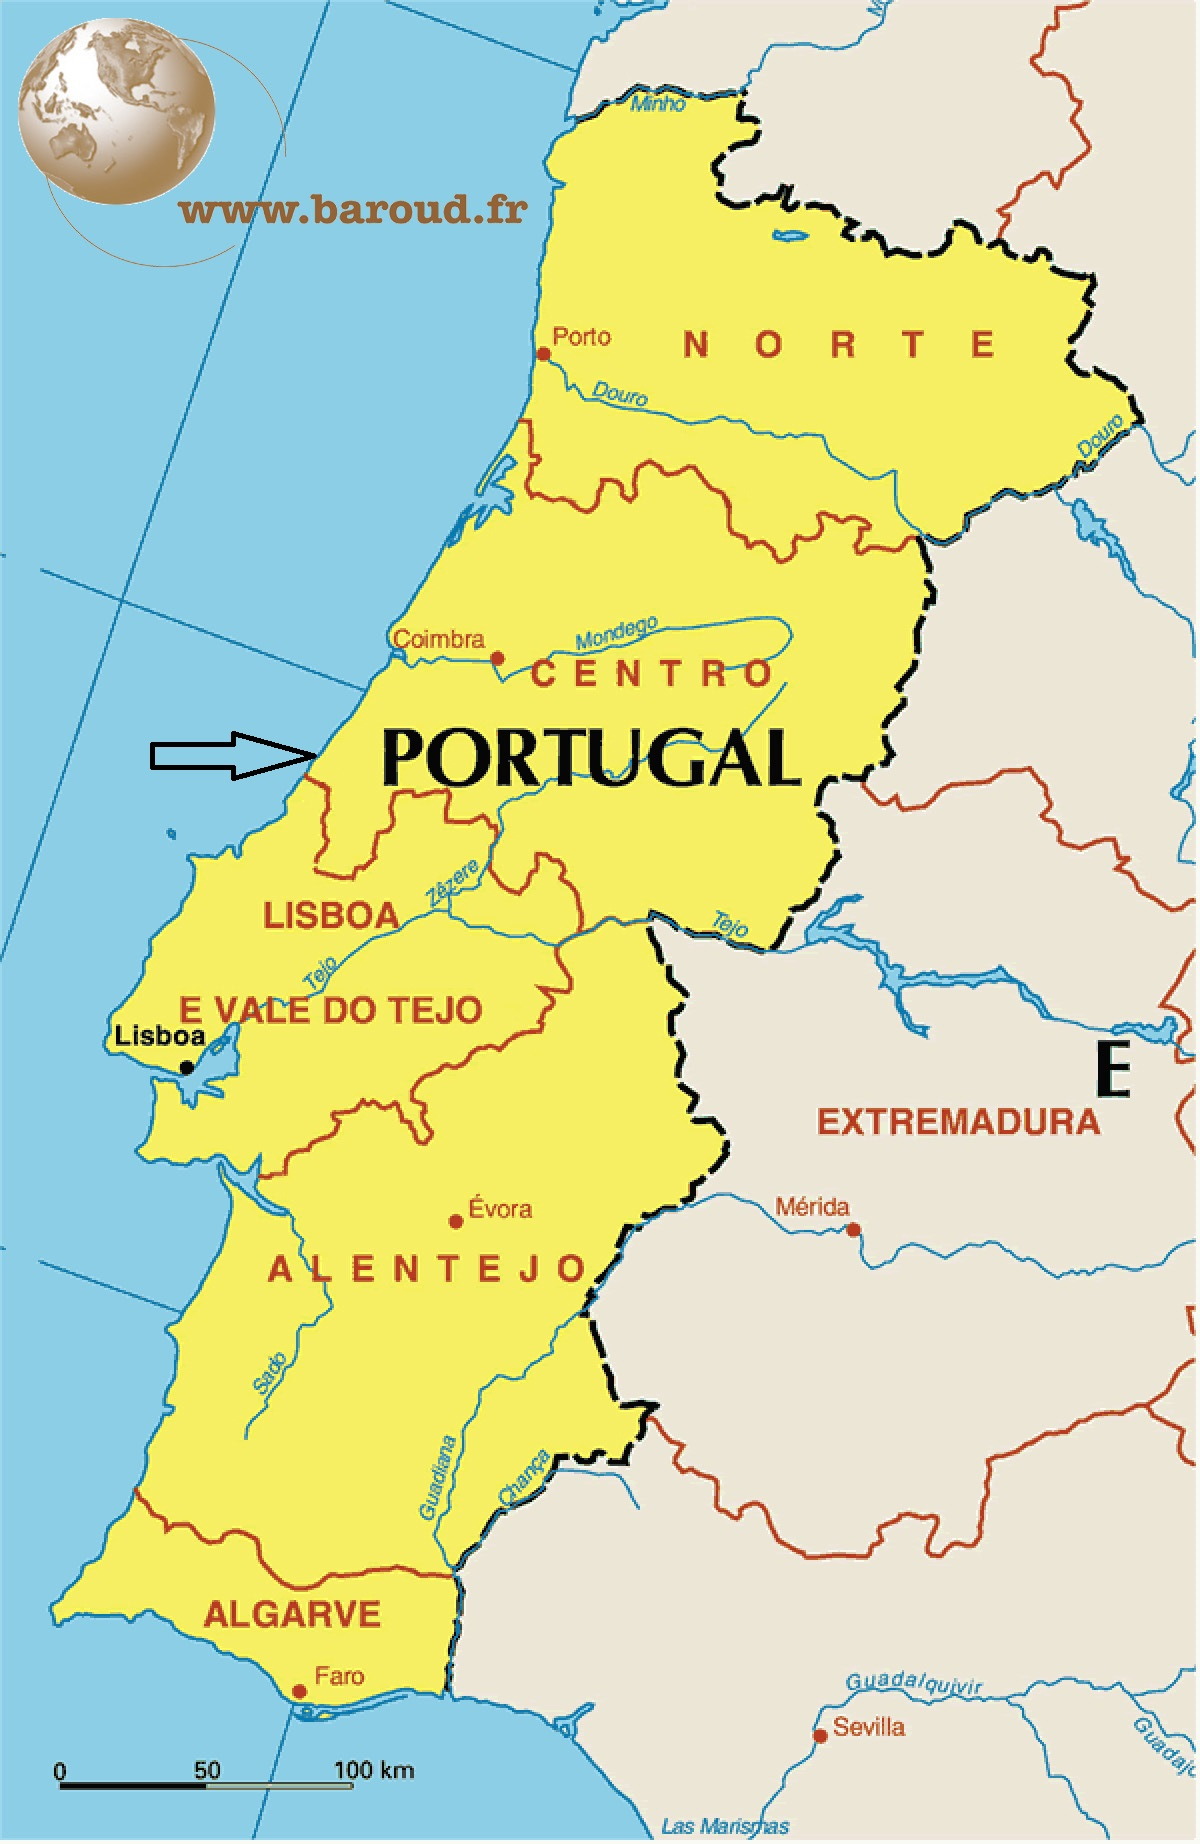 CARTES_PORTUGAL1.jpg